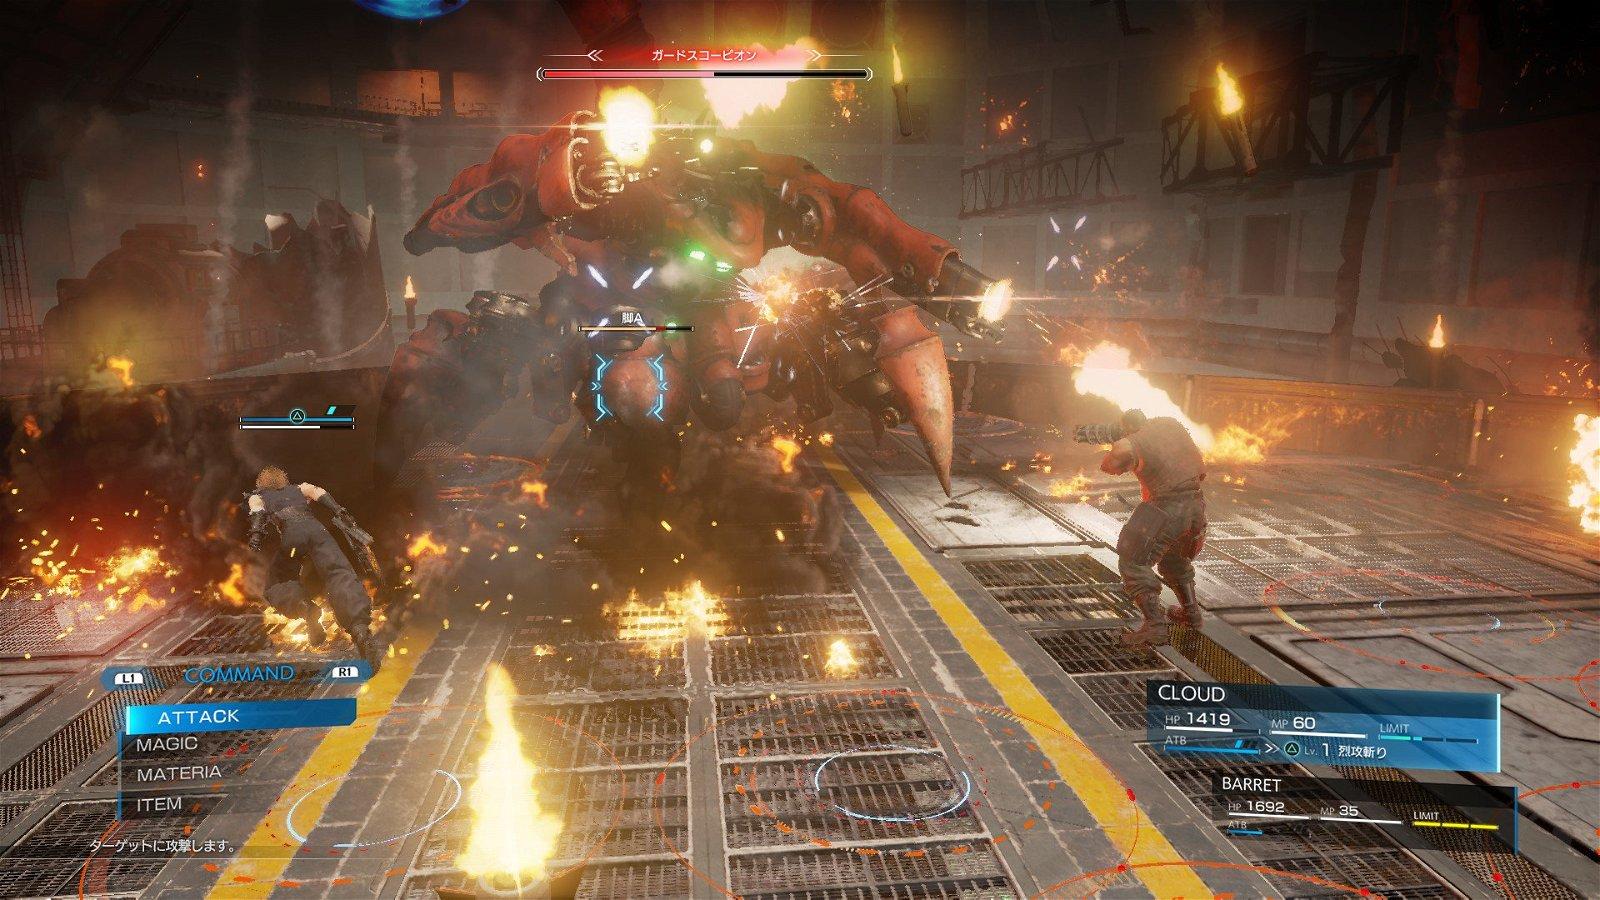 Nomura Reveals Final Fantasy Vii Remake'S Battle System 1